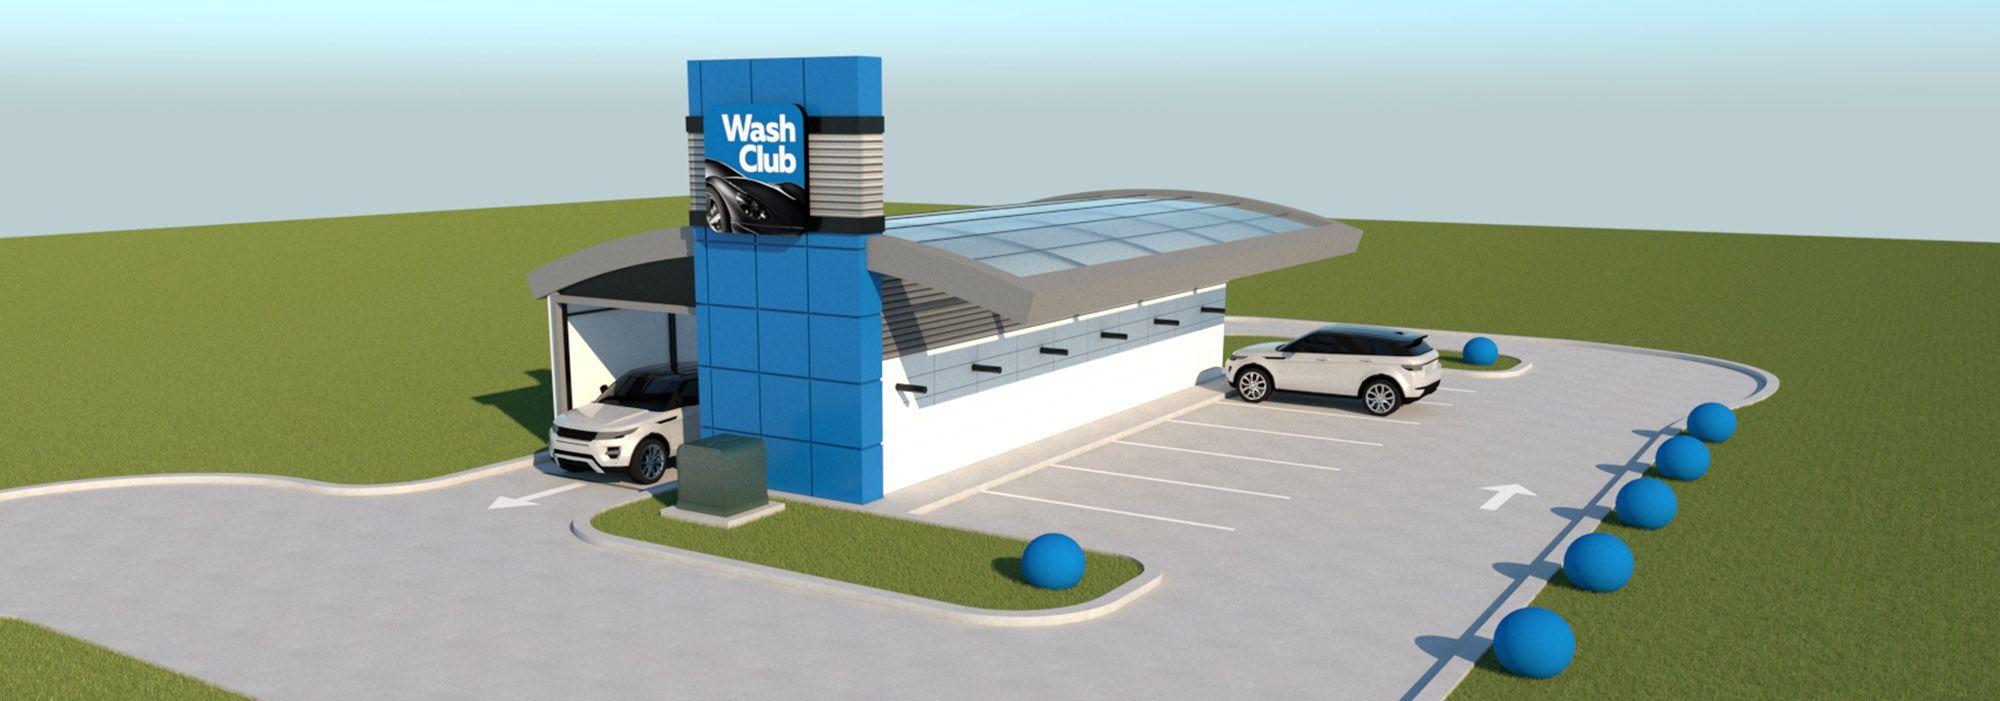 Tommy World model Car wash business, Car wash systems